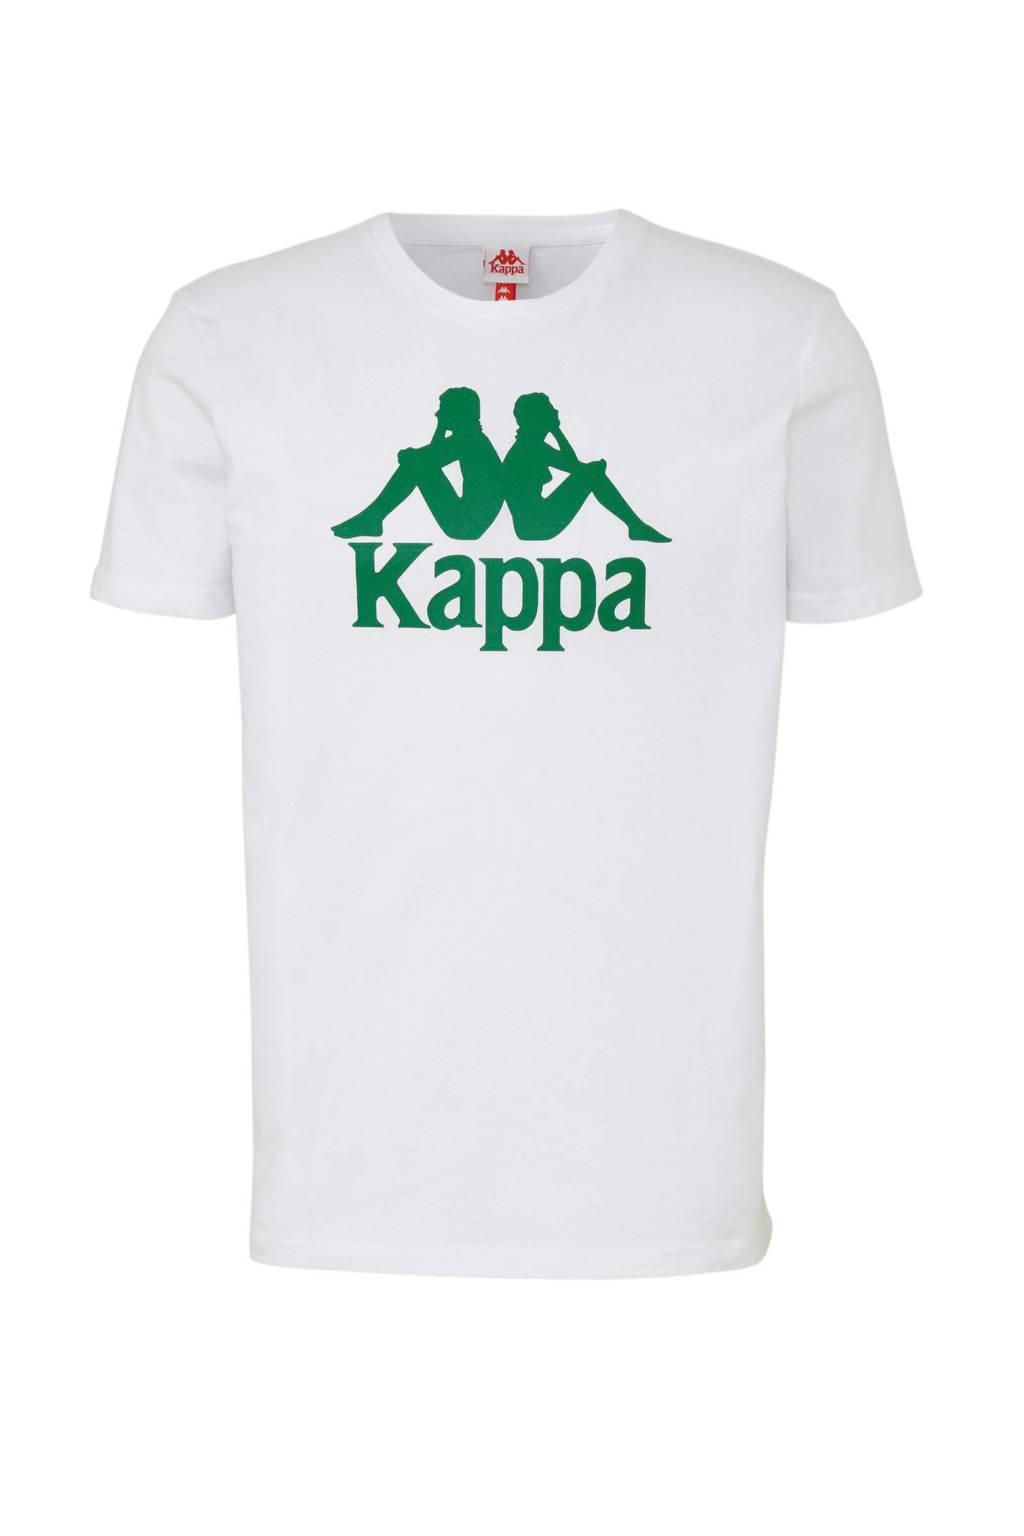 Kappa   T-shirt met printopdruk wit/groen, Wit/groen